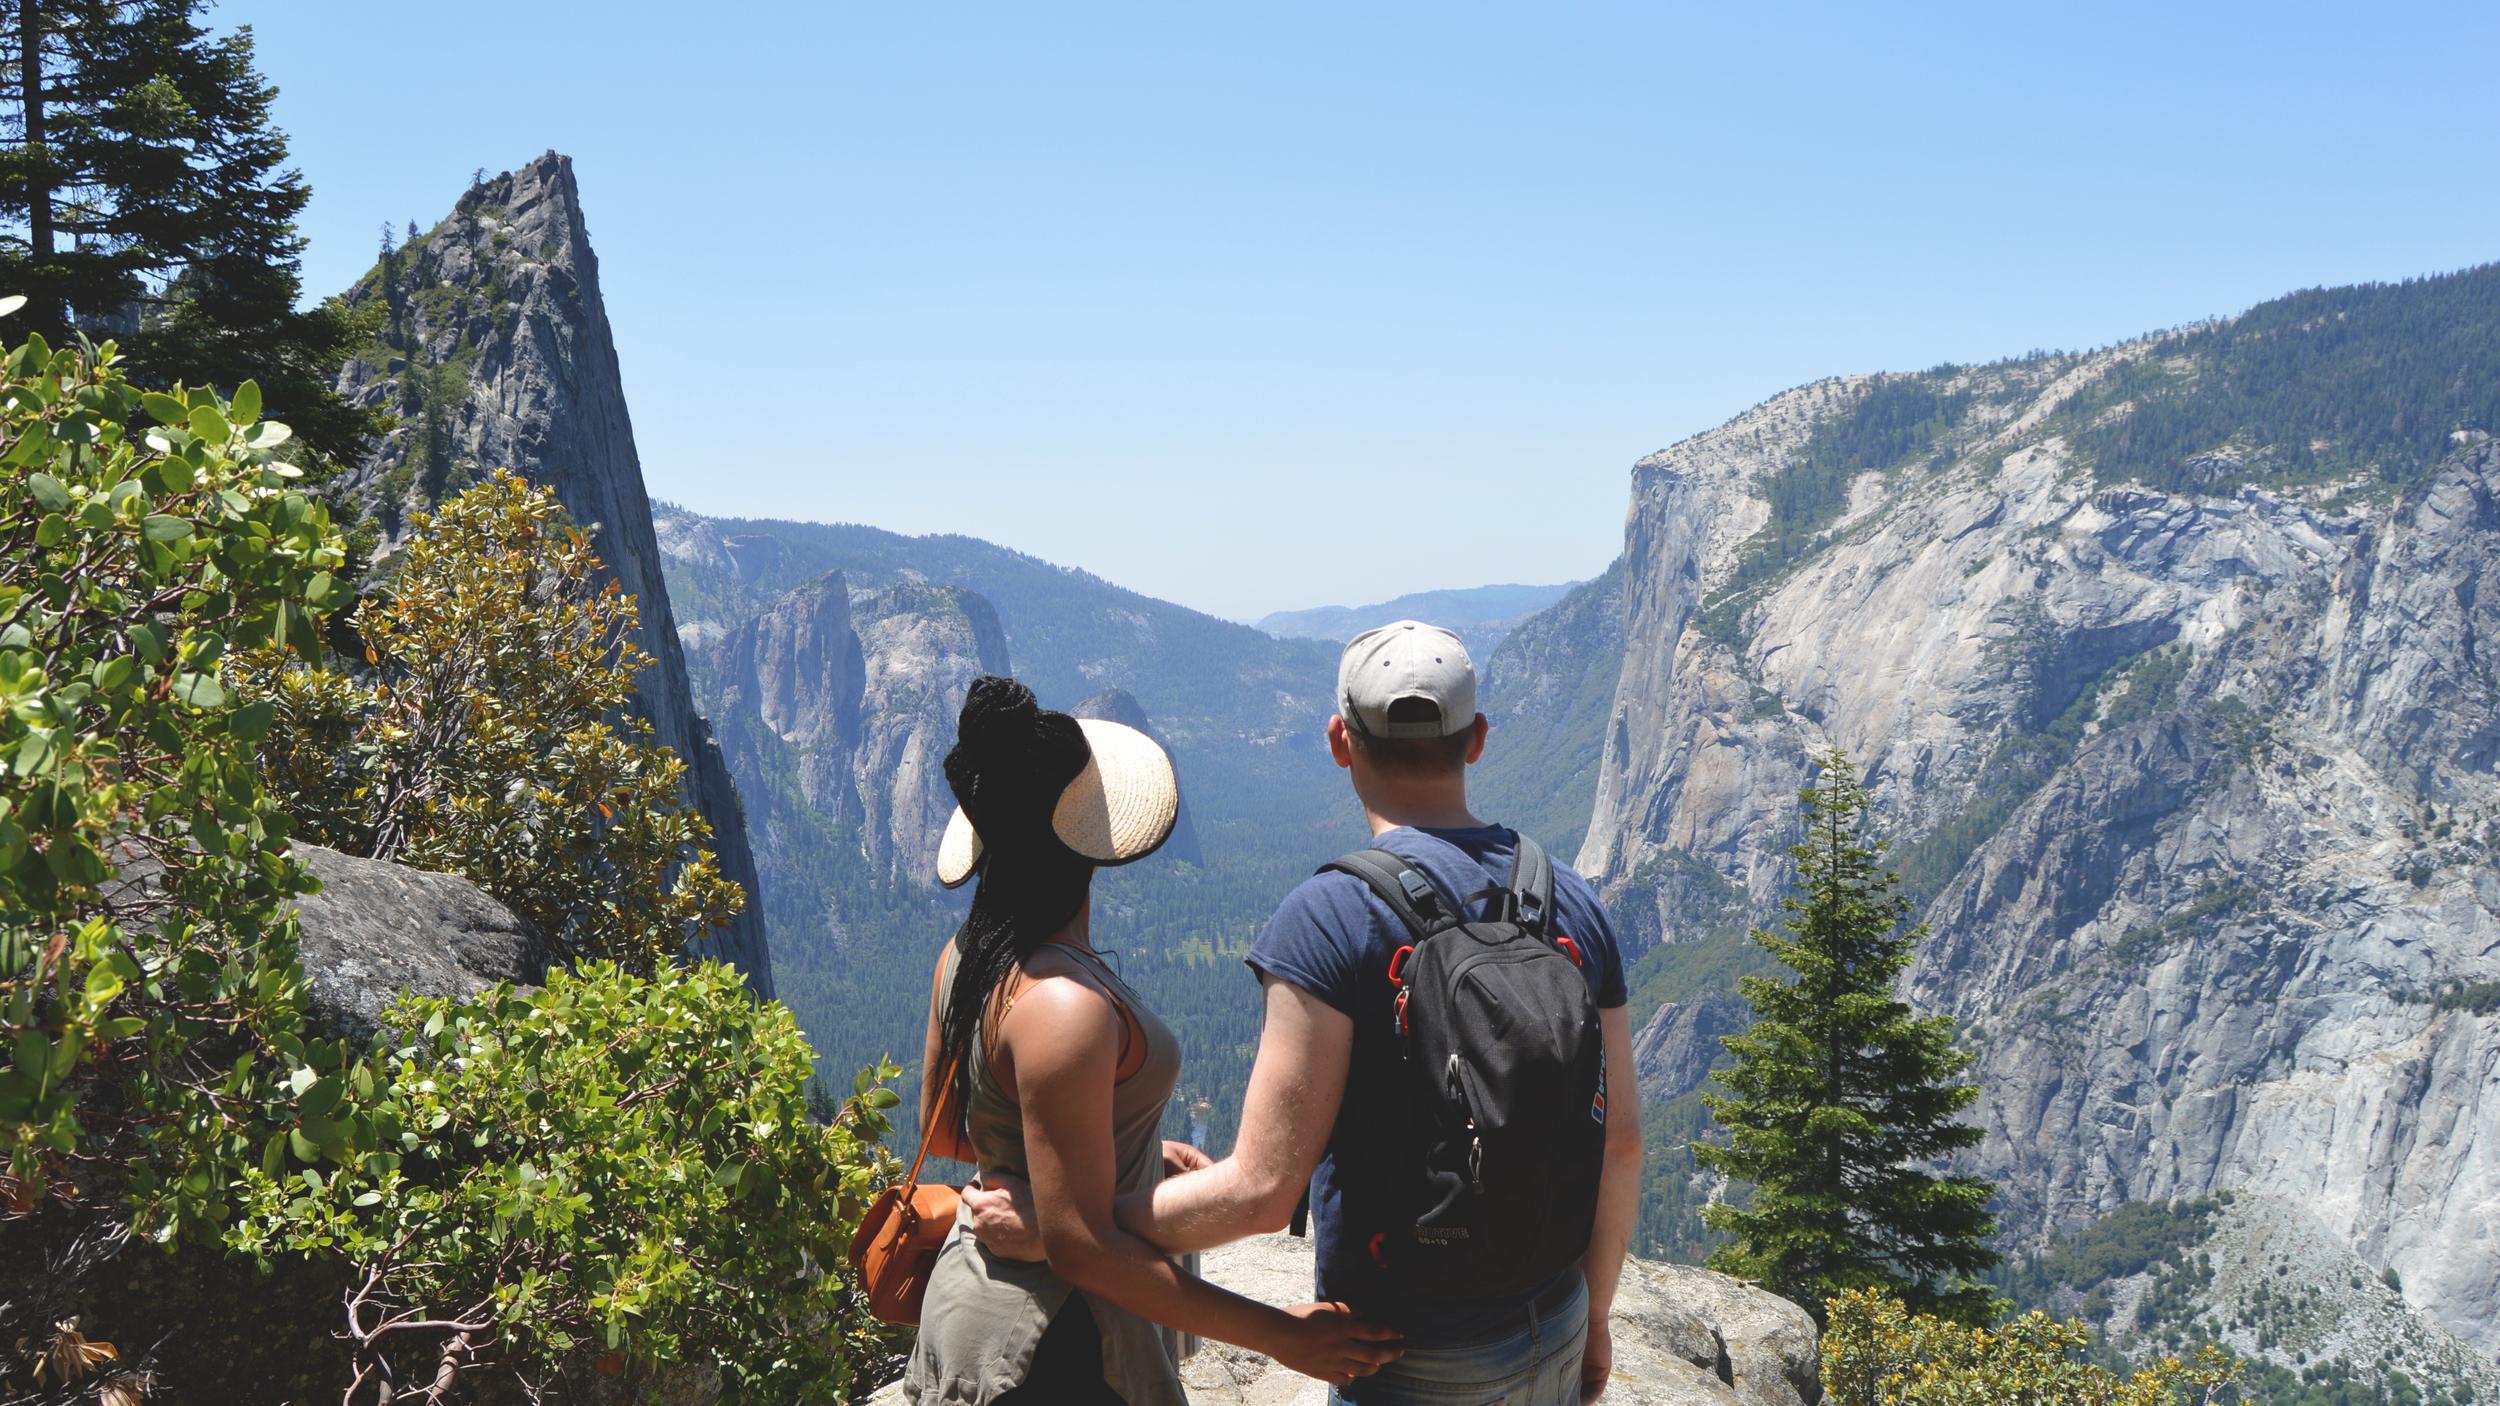 Abigail and Ben at Yosemite National Park, June 2015